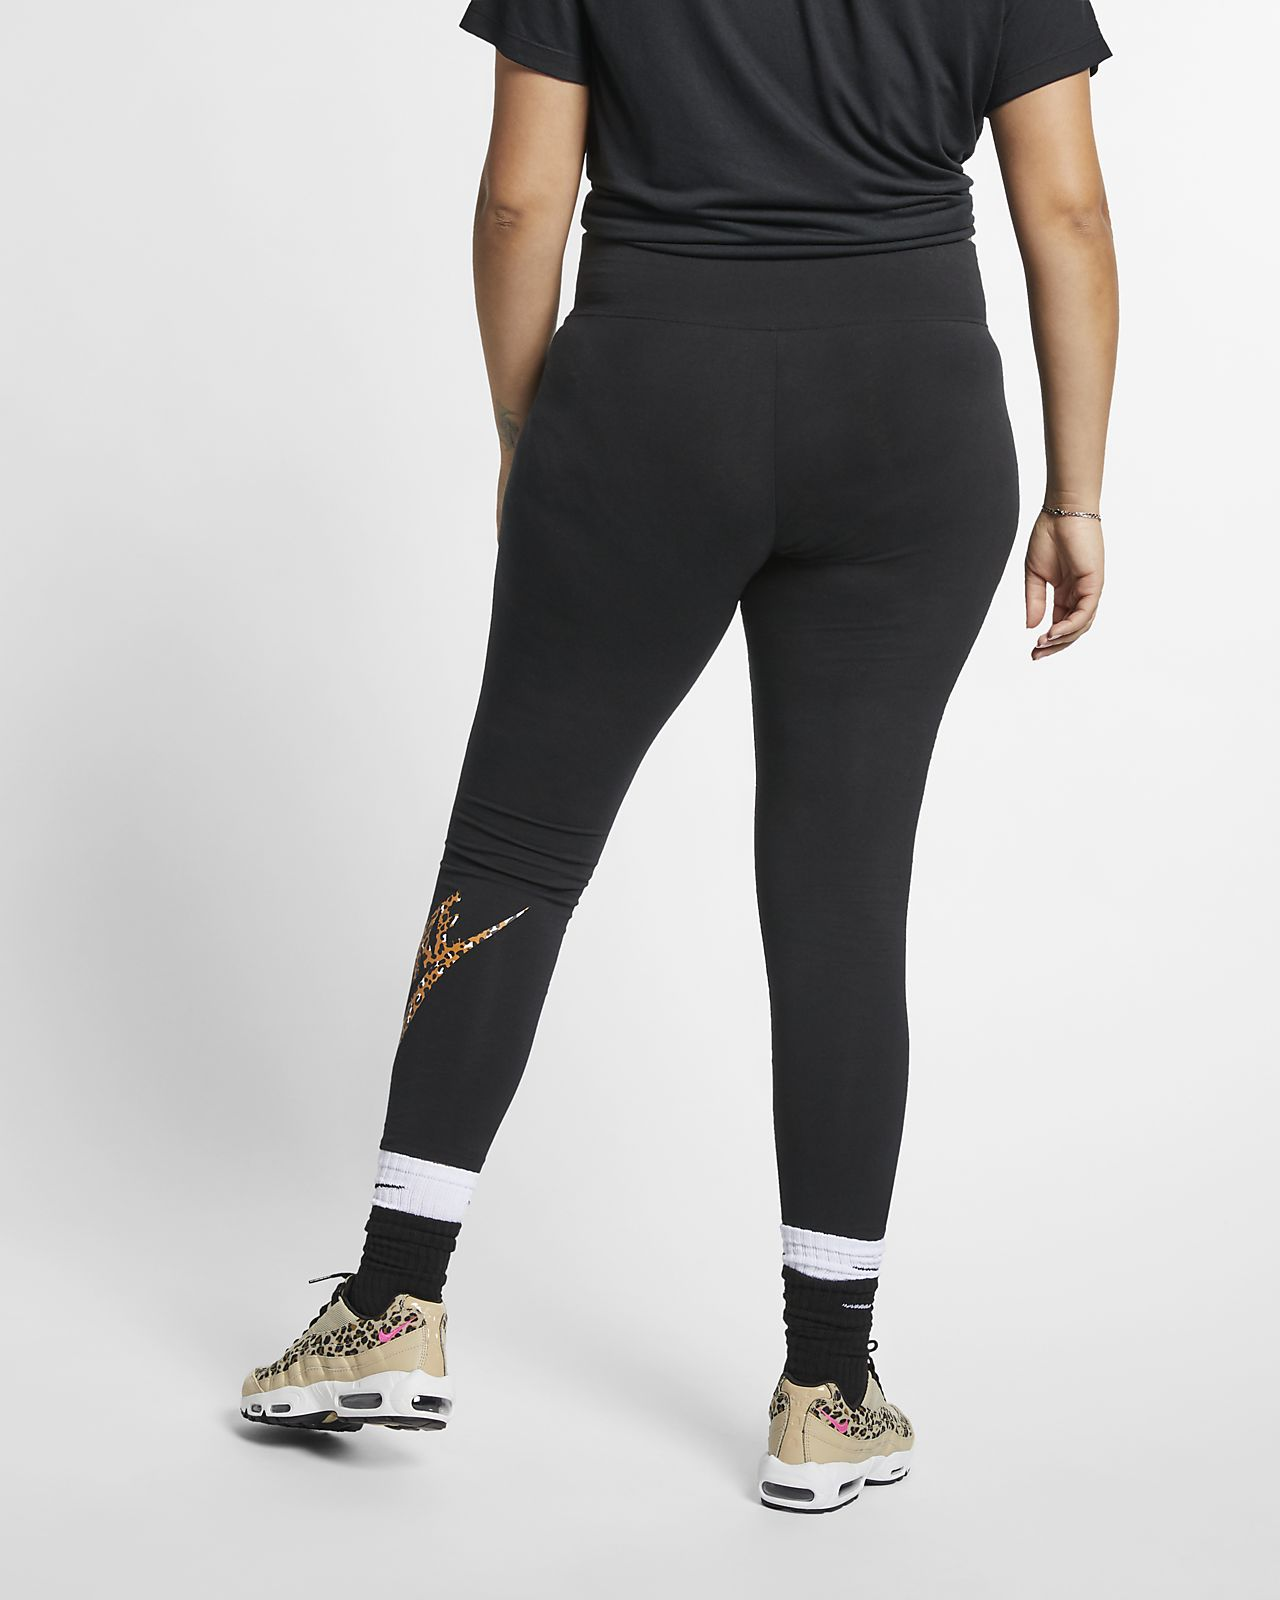 77fc50b8e Nike Sportswear Animal Print Women's Leggings (Plus Size). Nike.com